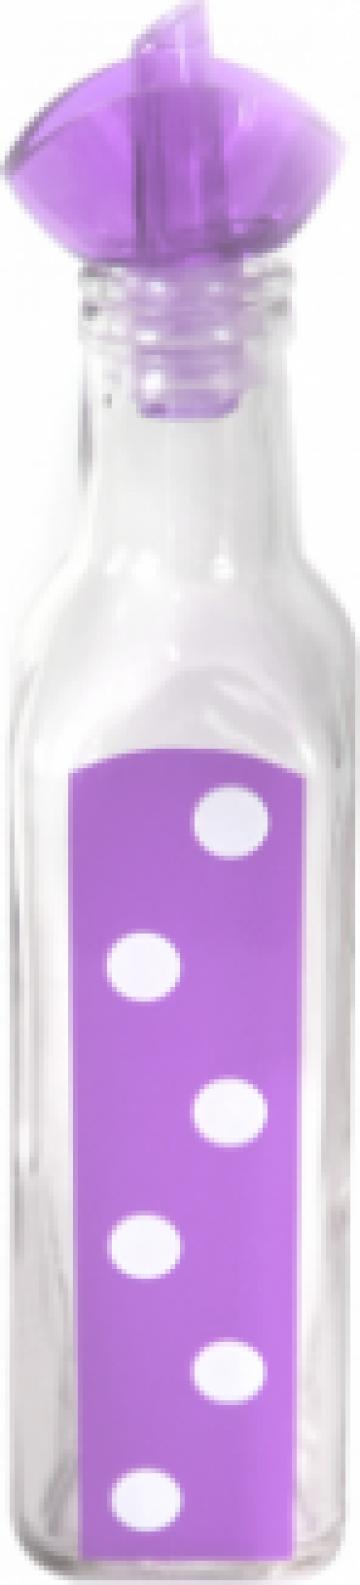 Sticla ulei masline M-151248 250ml mov cu buline de la Basarom Com